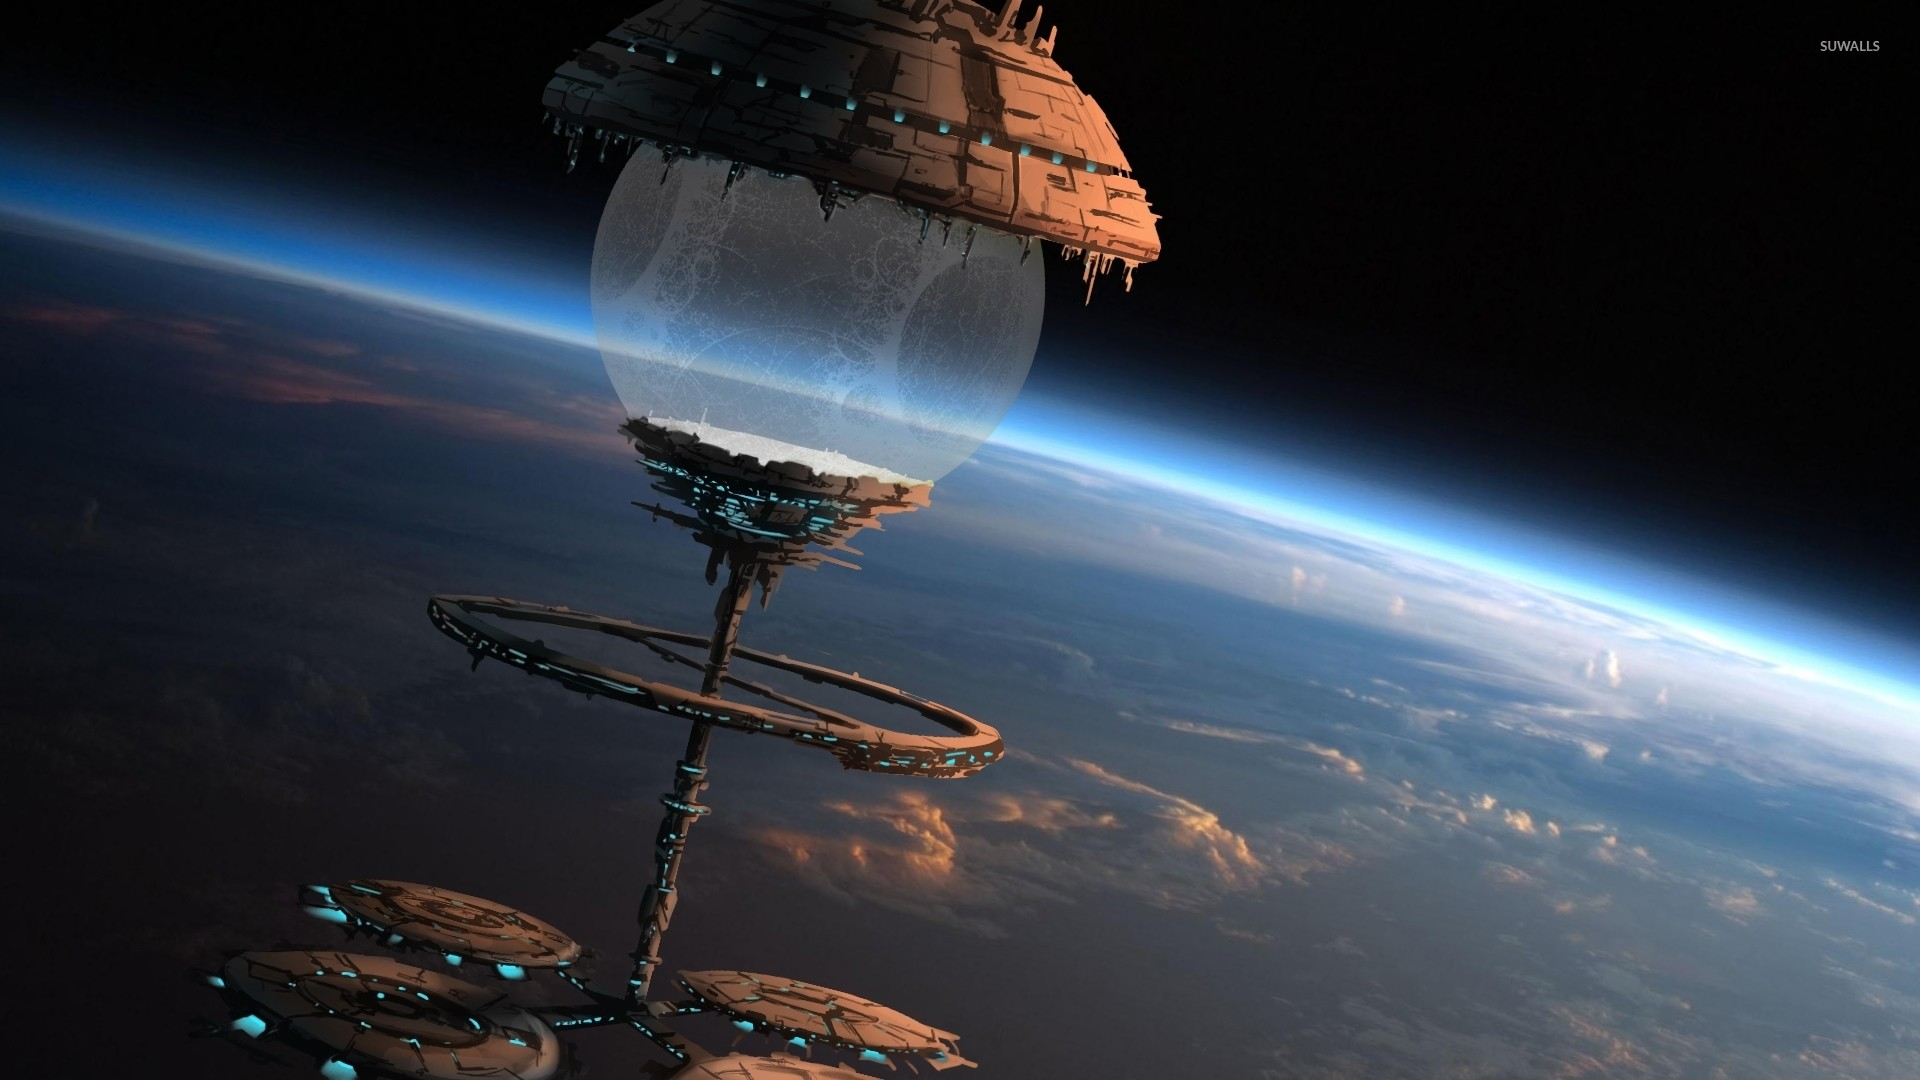 Space station orbiting a planet wallpaper jpg